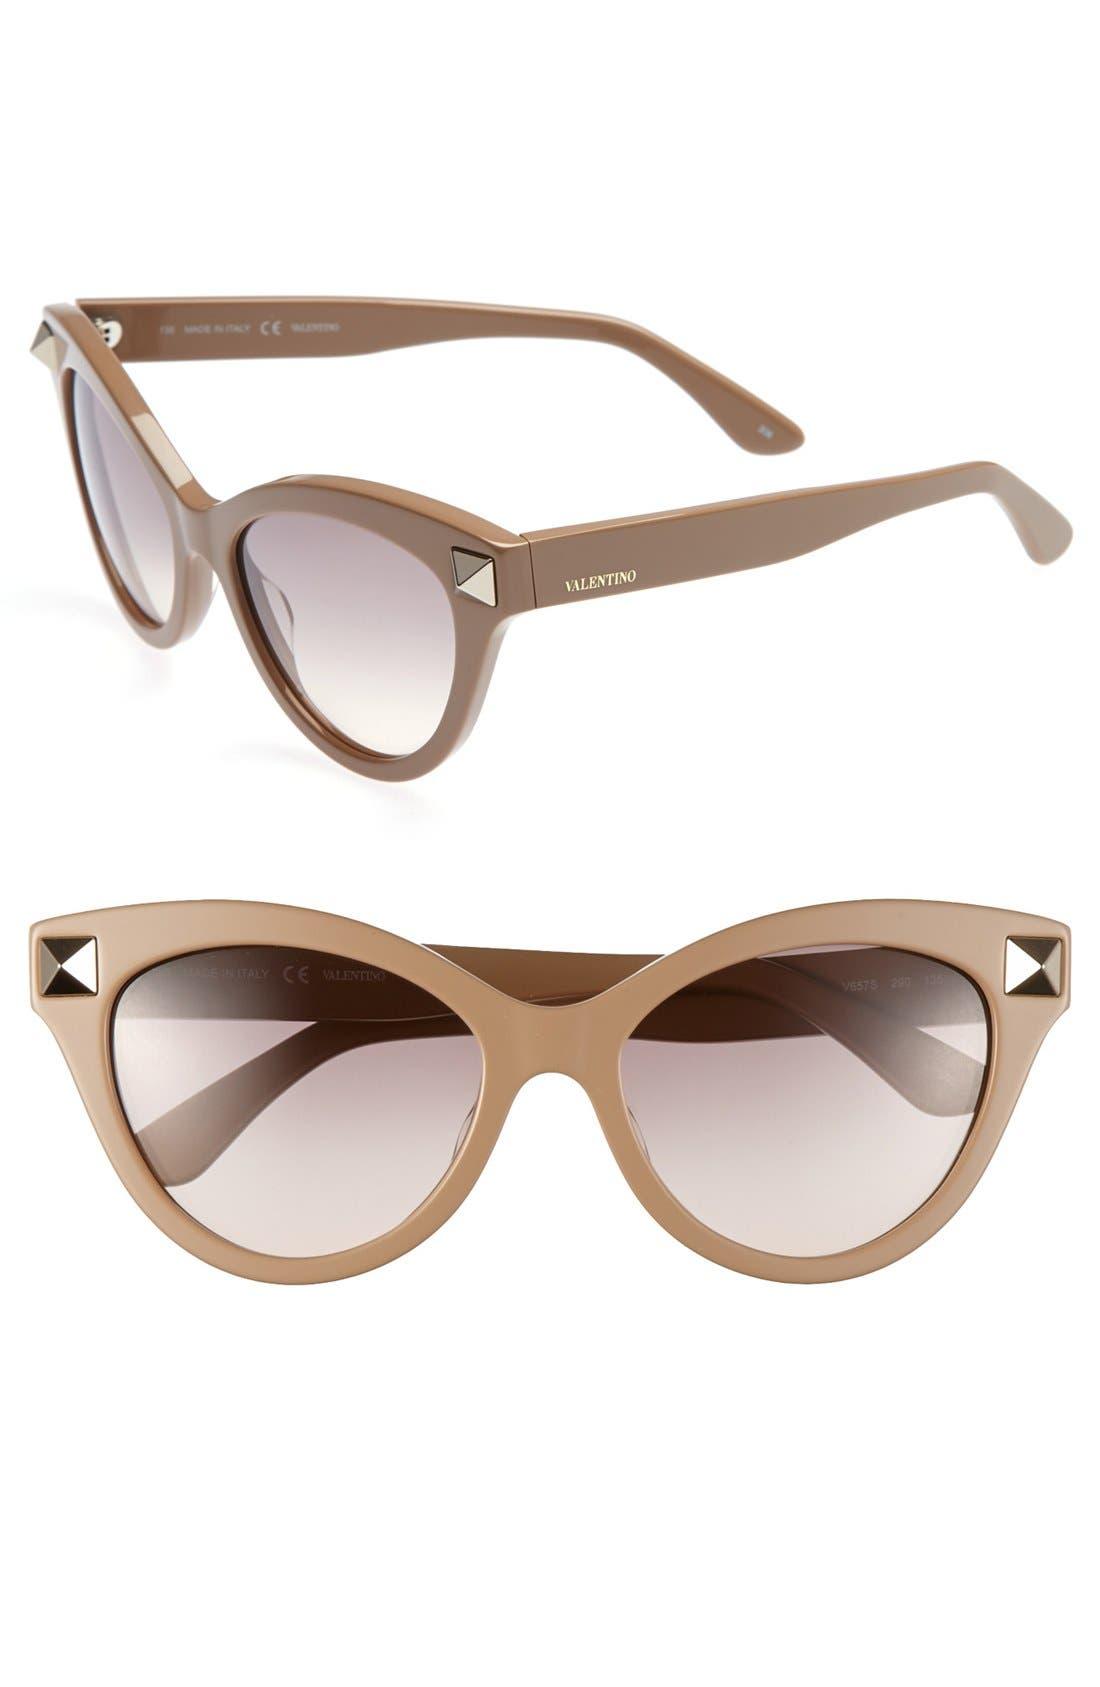 Alternate Image 1 Selected - Valentino 'Rockstud' 53mm Retro Sunglasses